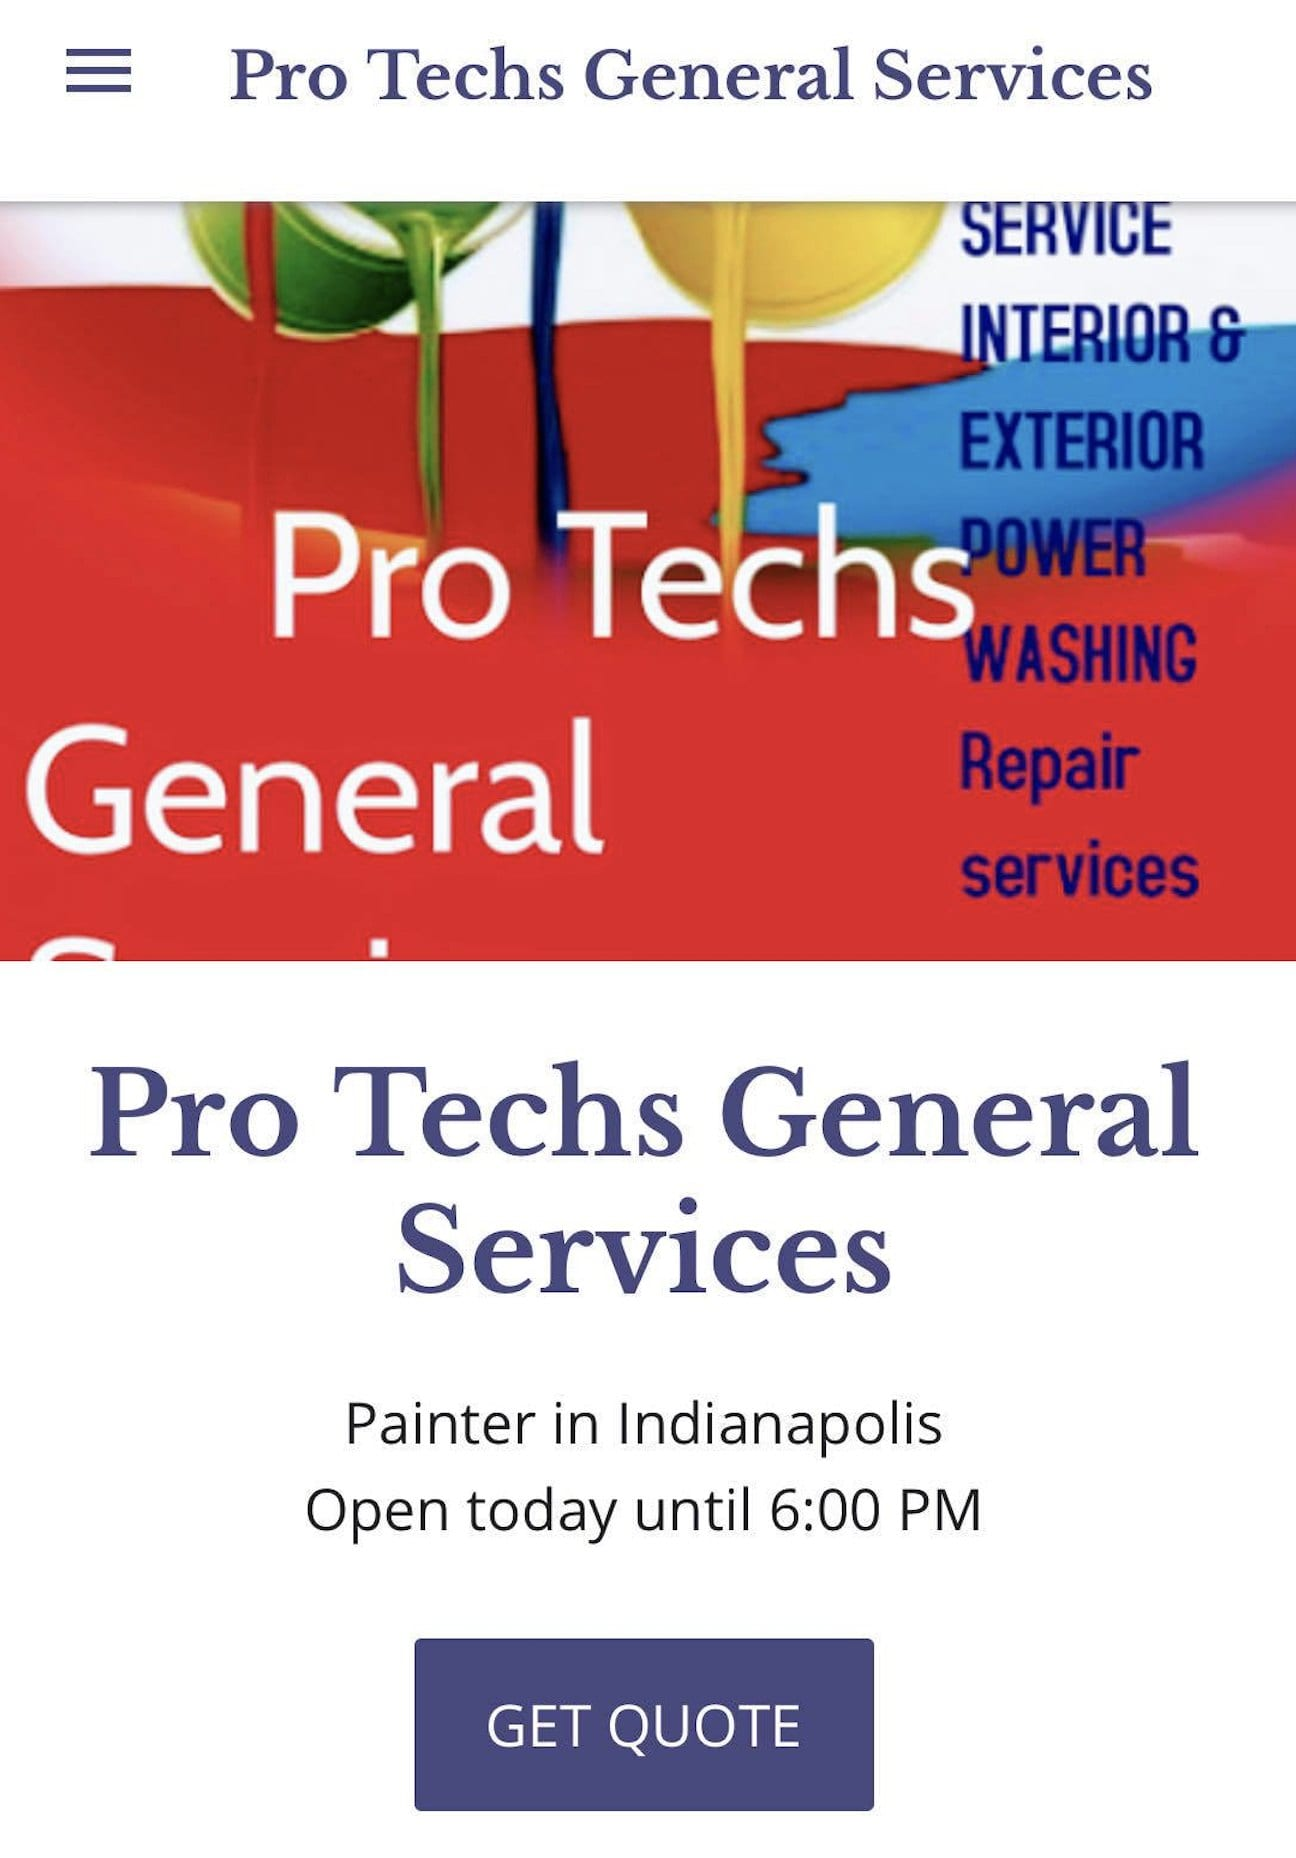 Pro Techs General Services